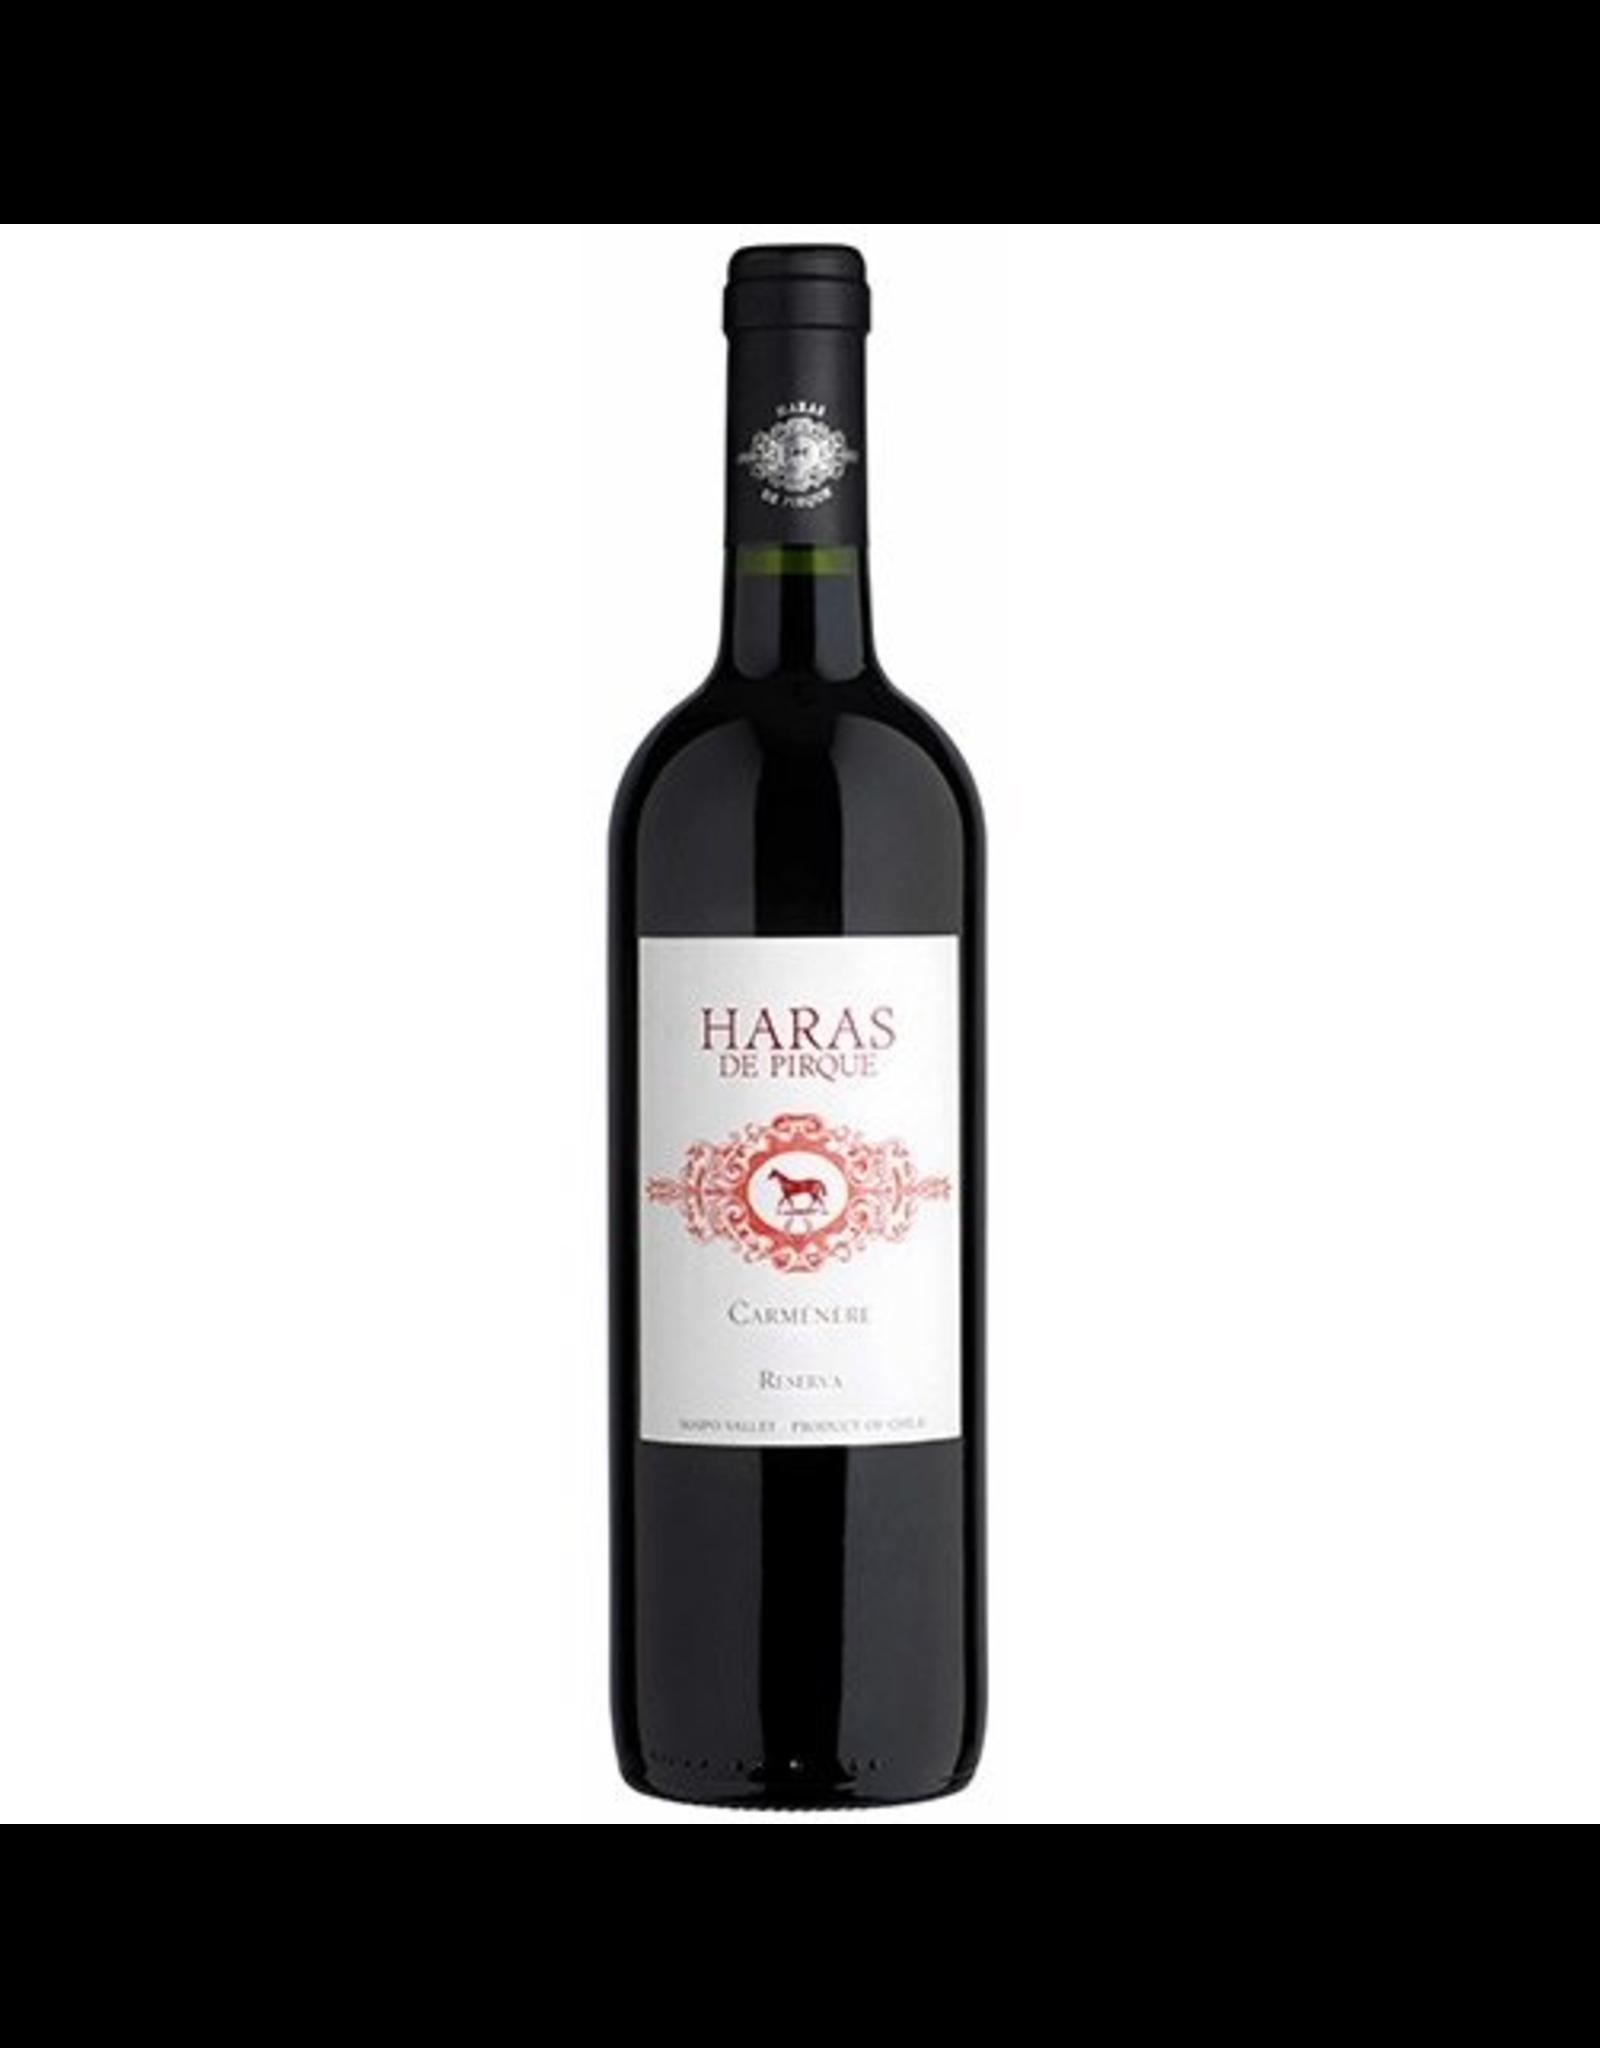 Red Wine 2015, Haras de Pirque Reserve, Carmenere, Pirque, Maipo Valley, Chile, 14.0% Alc, CTnr, JS90